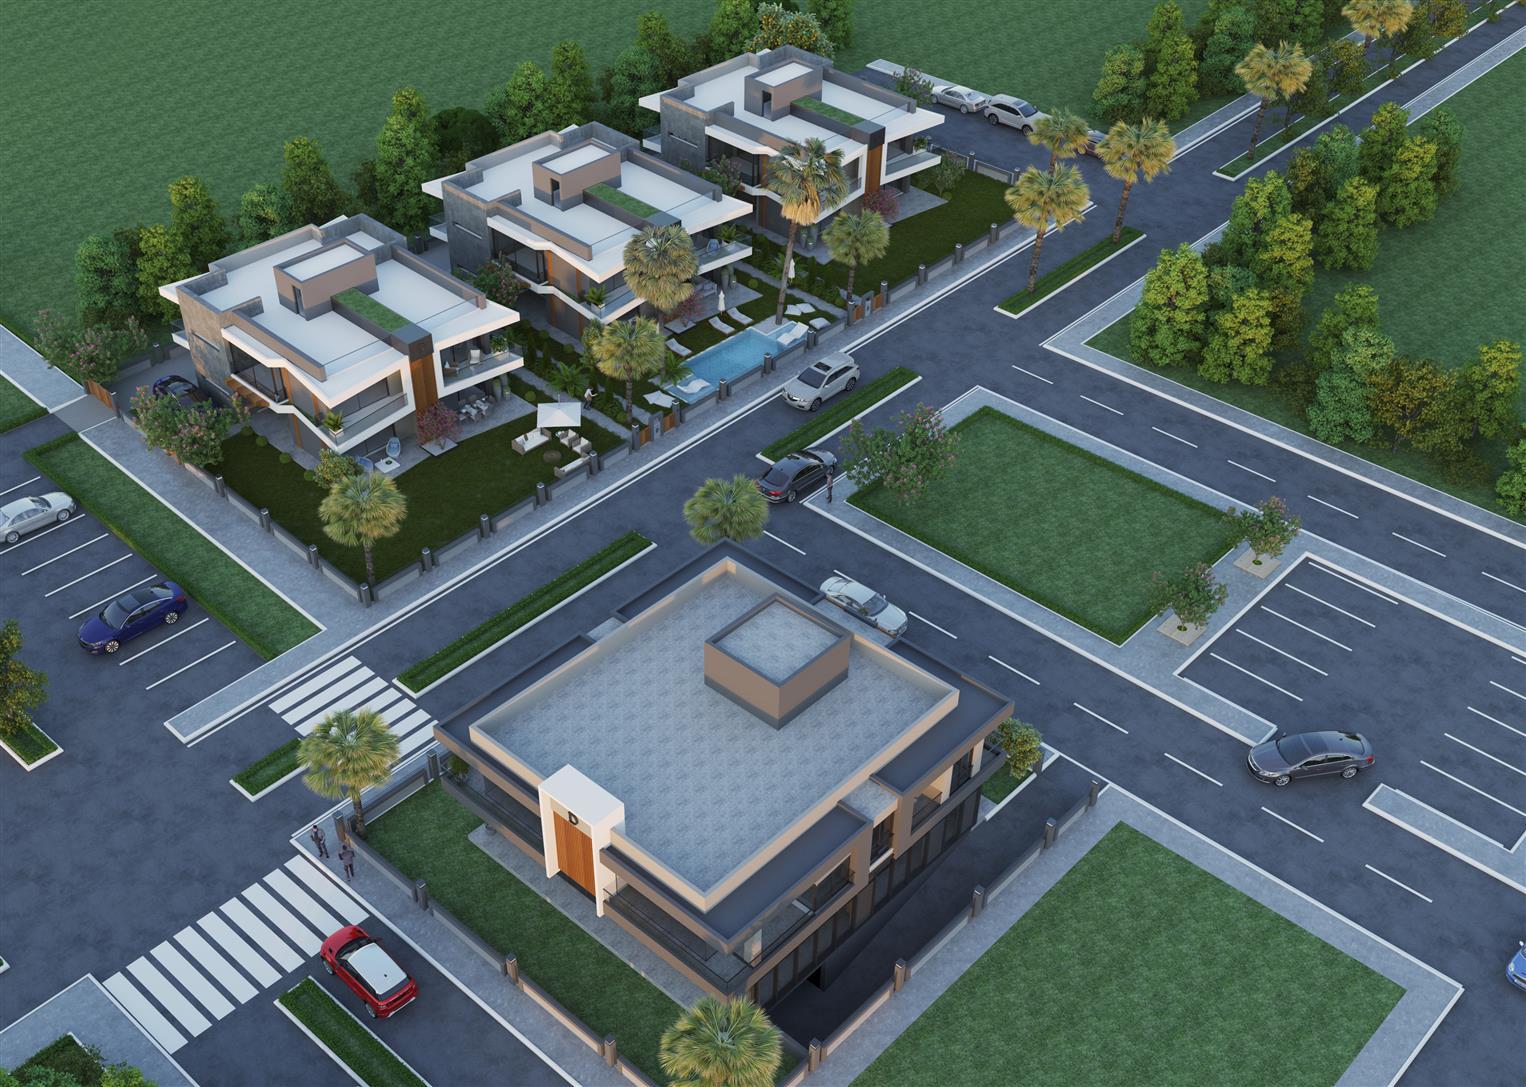 demren-park20171617553996.jpg Demren İnşaat Proje